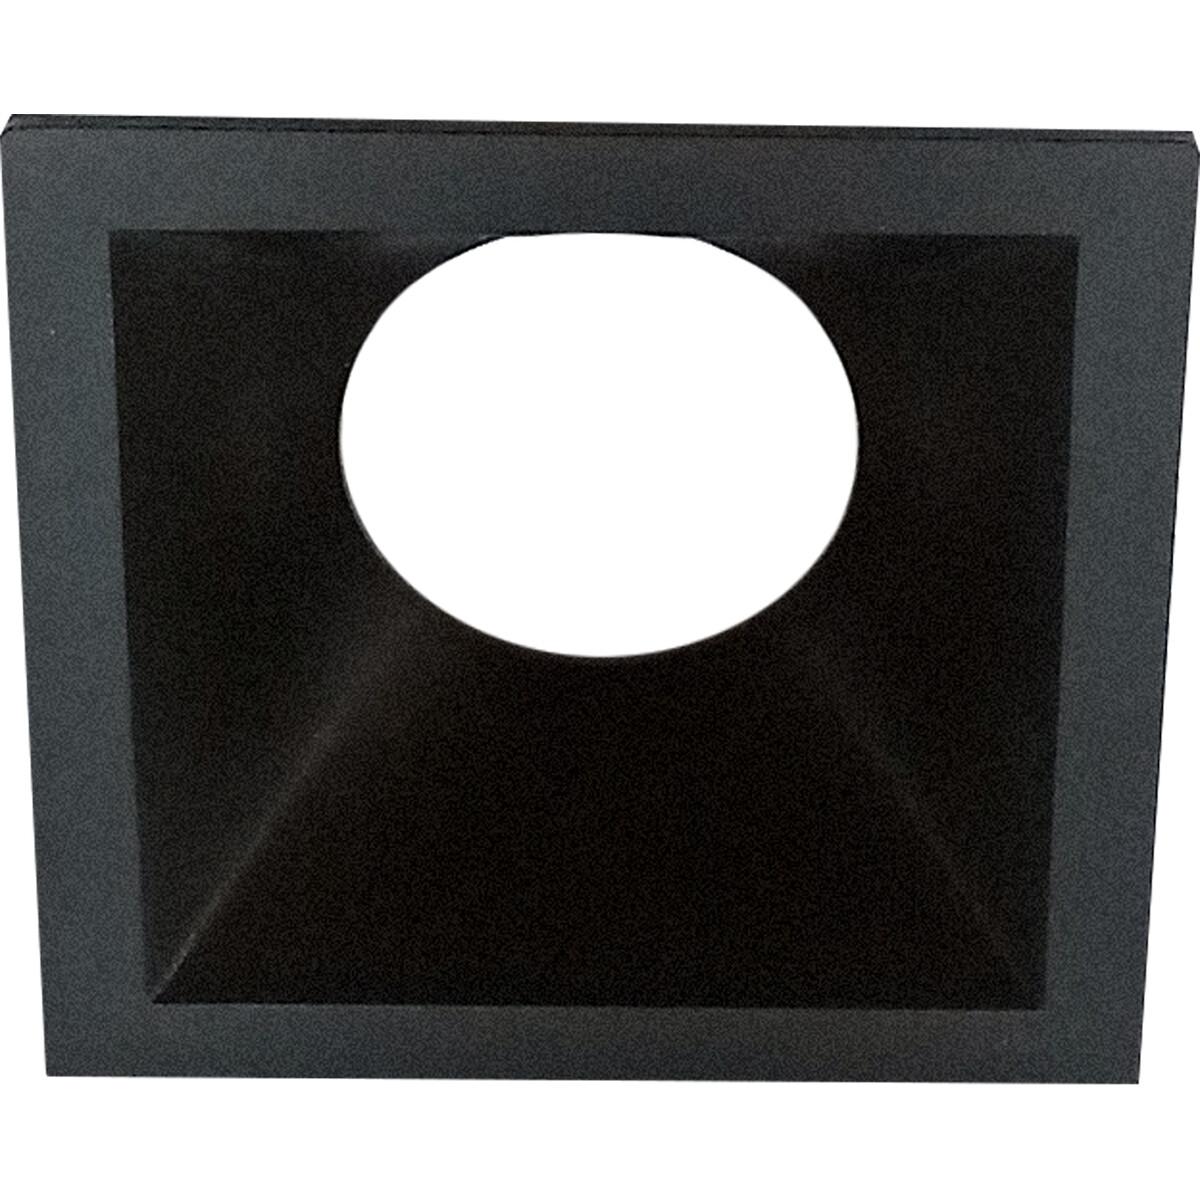 Spot Ring - Pragmi Cliron Pro - Vierkant - Mat Zwart